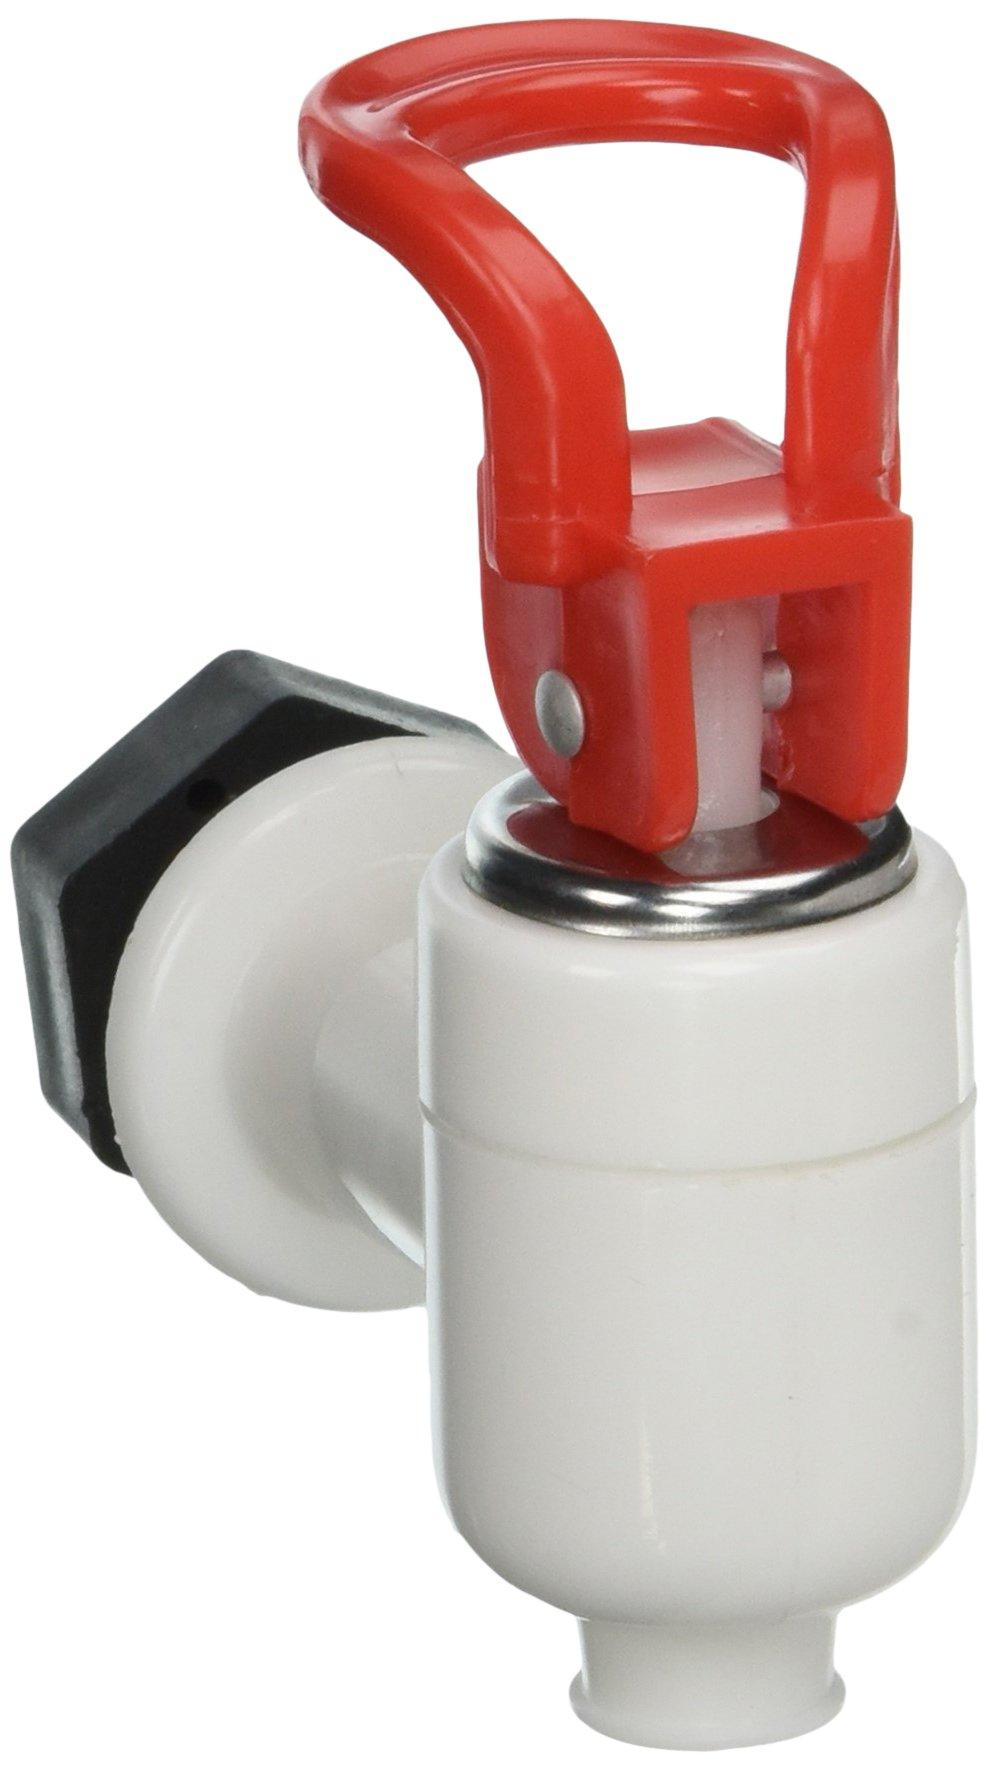 Uxcell Plastic Cooler Valve Spigot Water Dispenser Tap, White Red, White Red